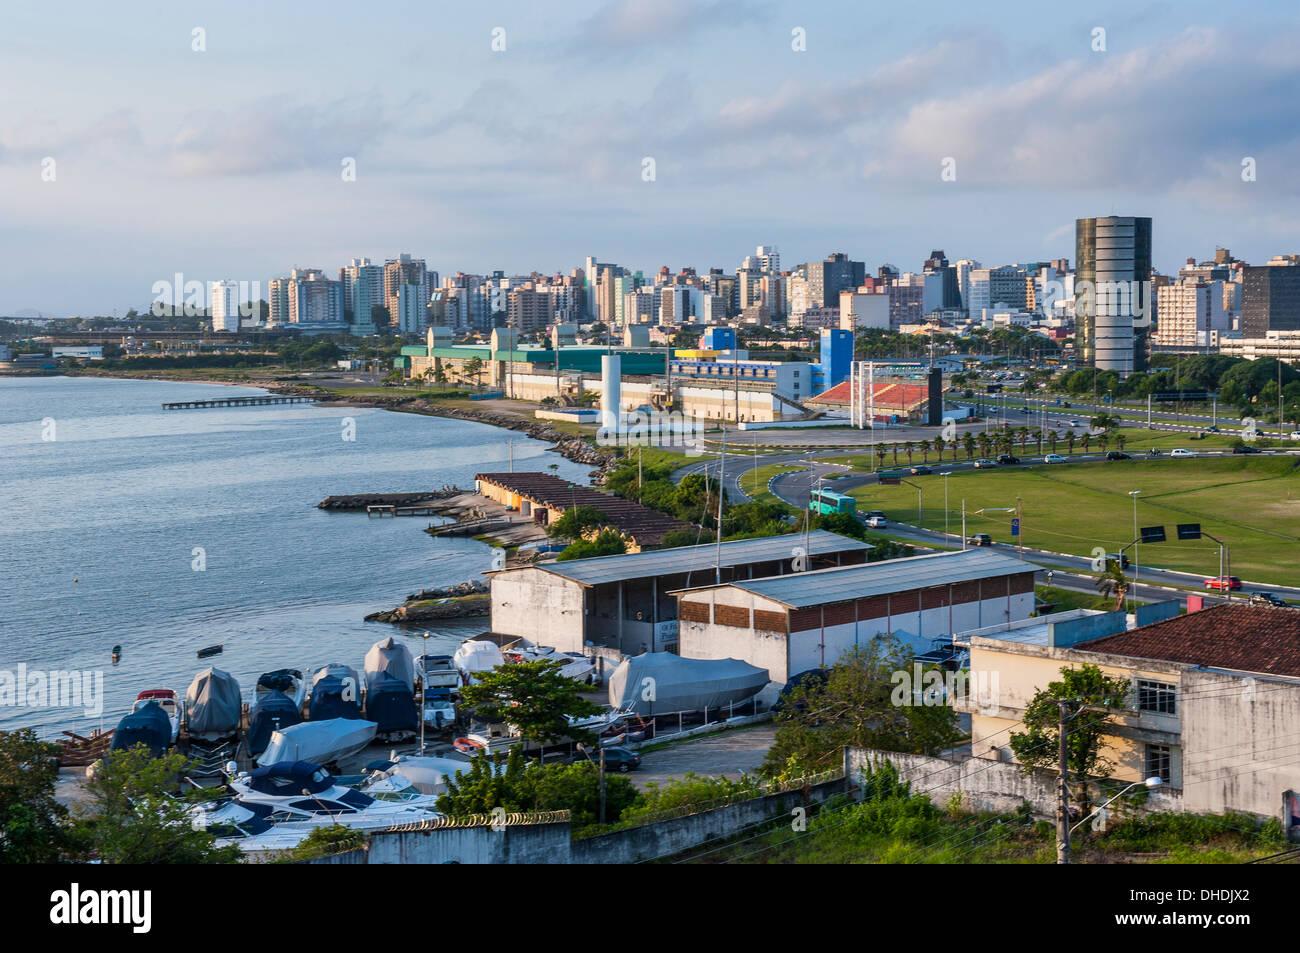 View over Florianopolis, Santa Catarina State, Brazil - Stock Image